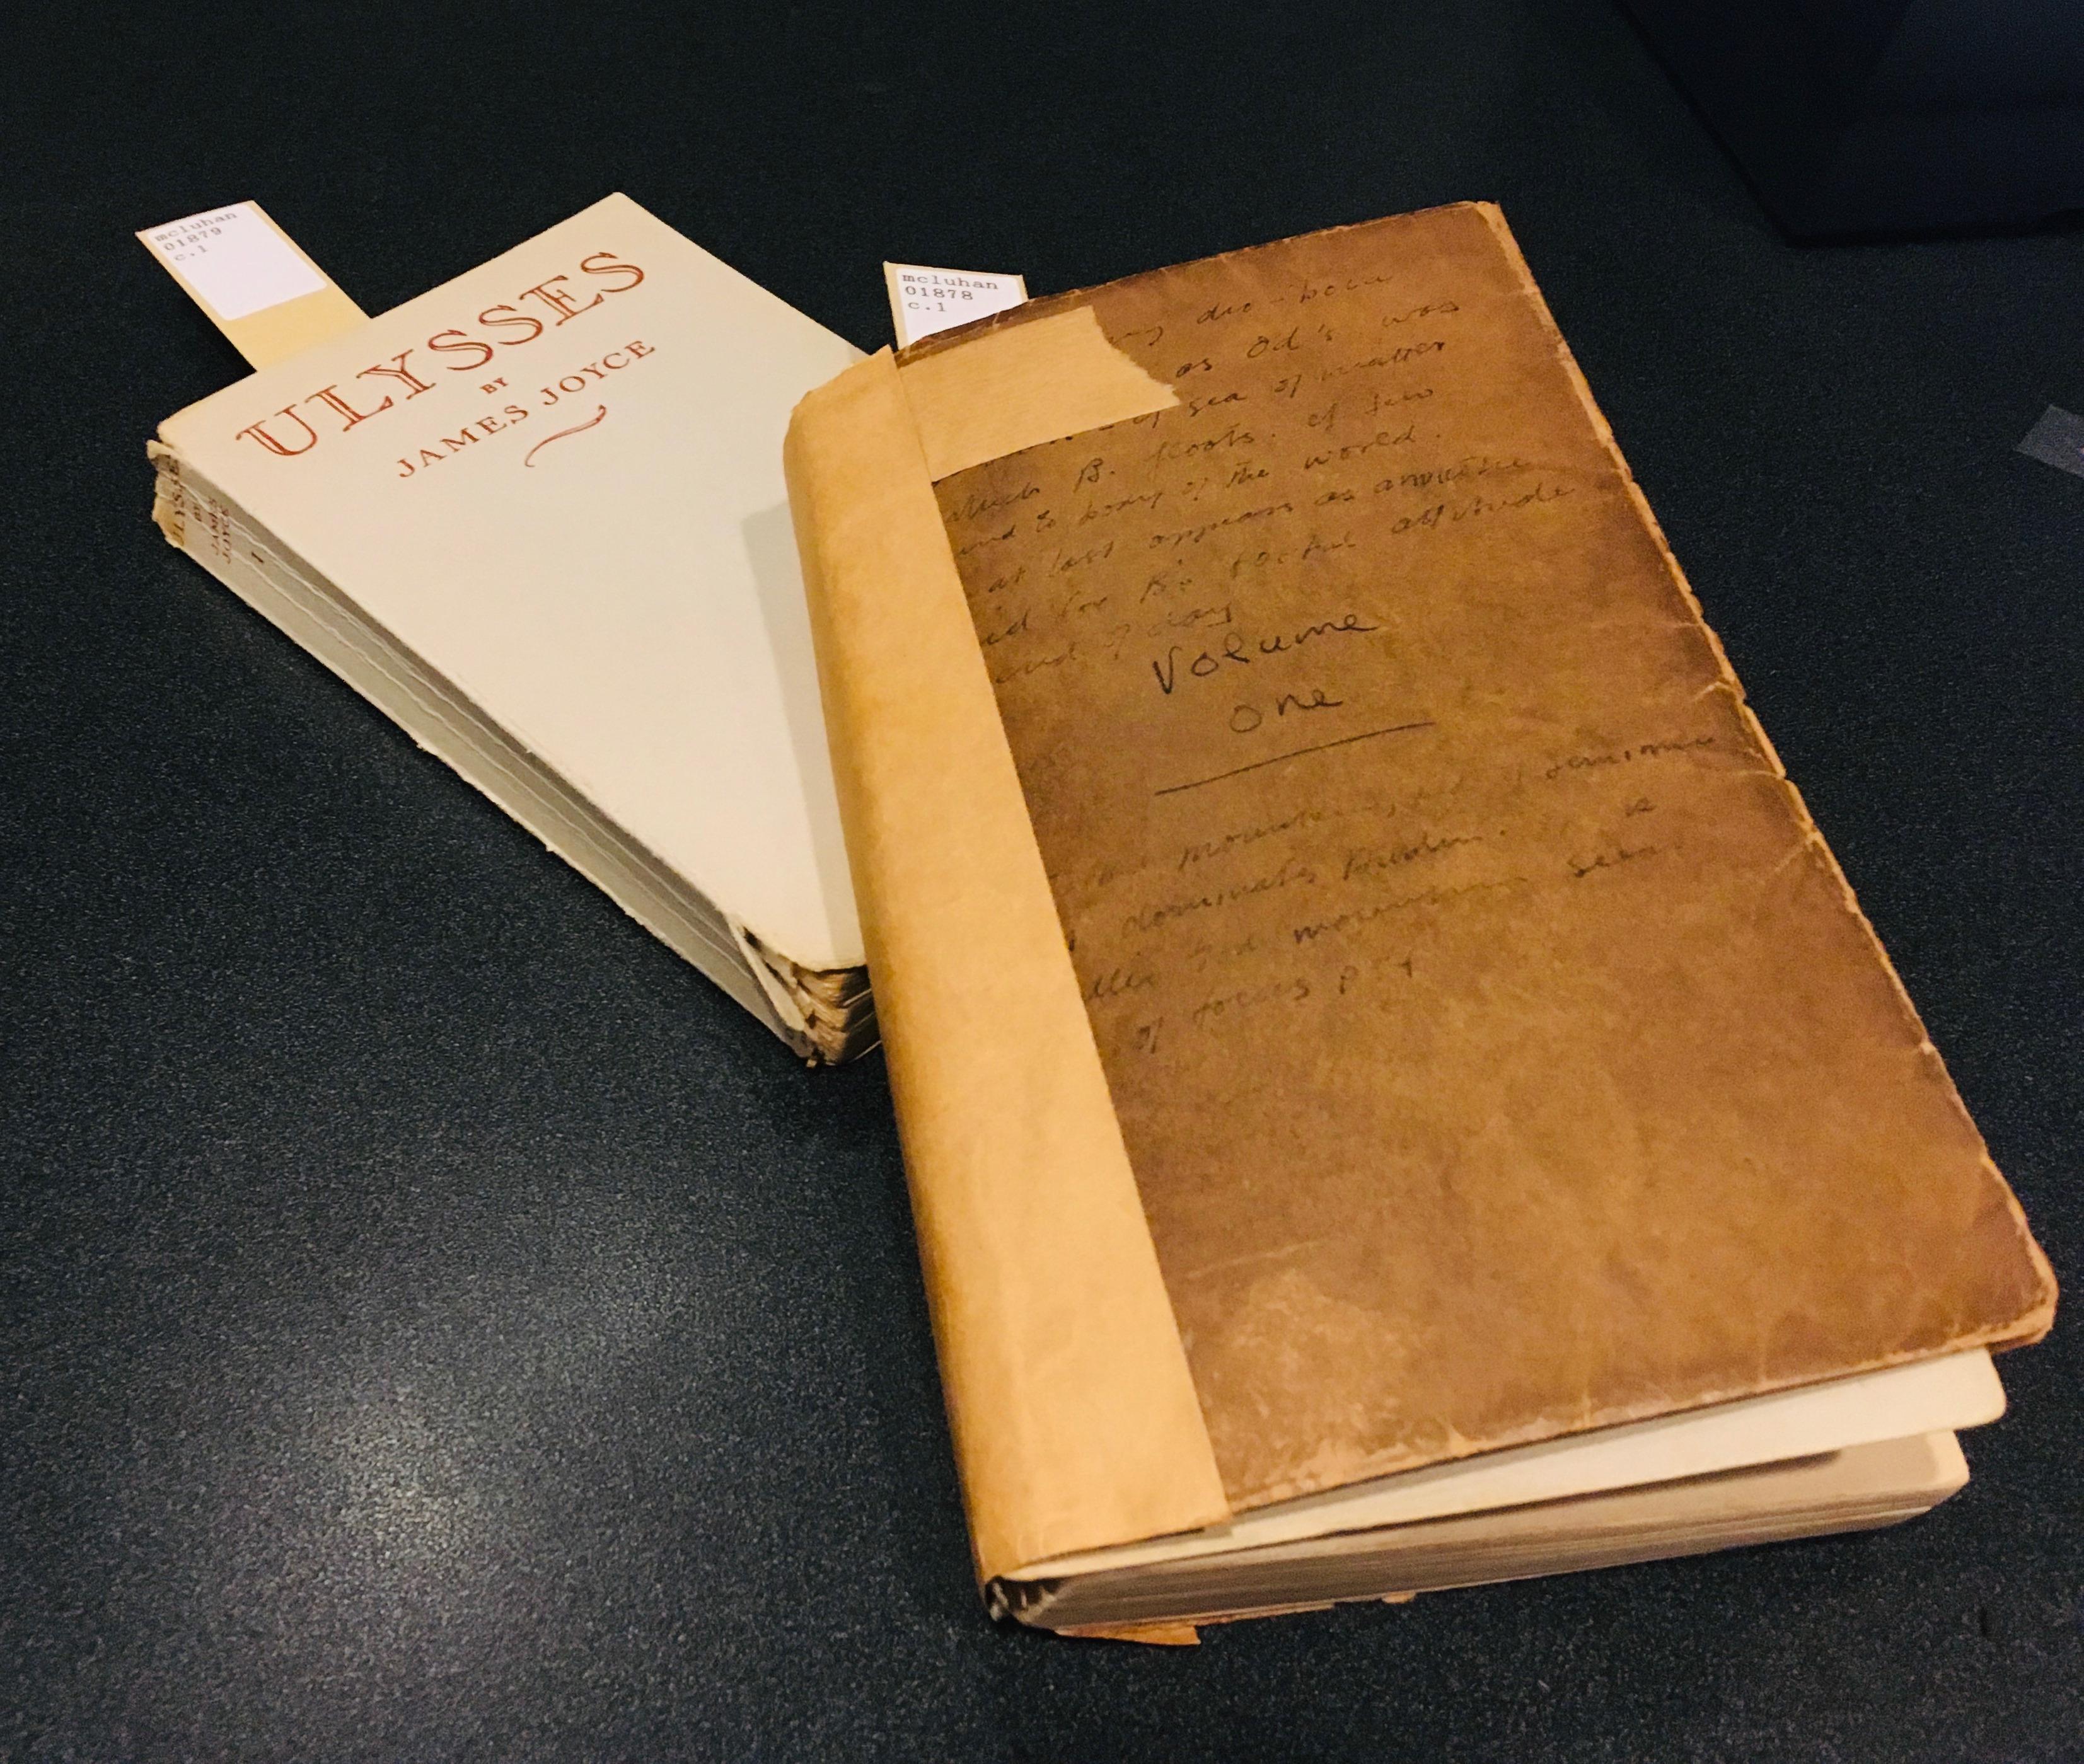 McLuhan Odyssey Press Ulysses